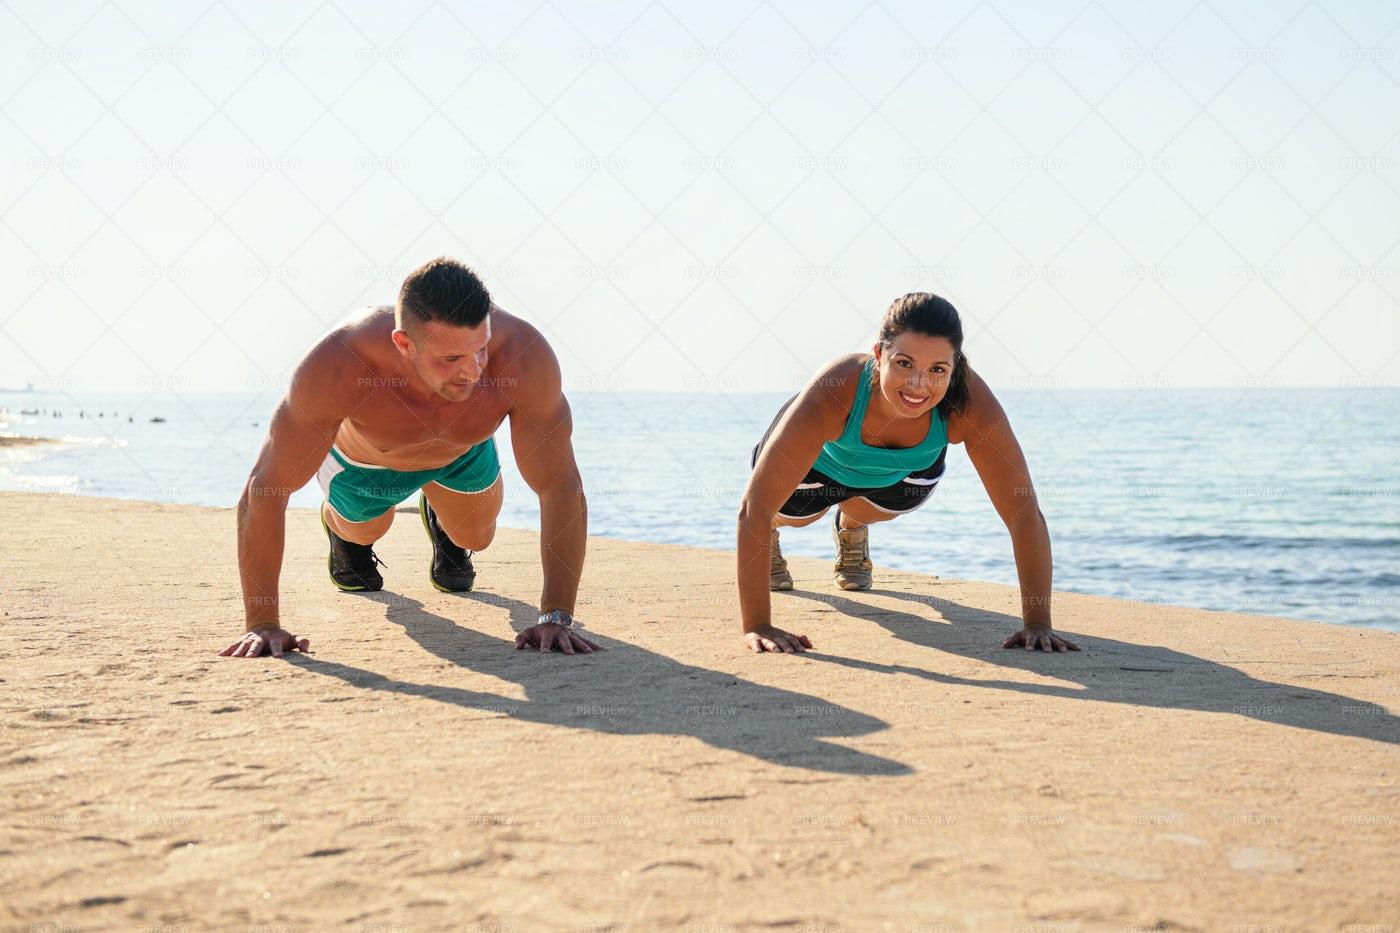 Man And Woman Do Push-Ups At The Beach: Stock Photos